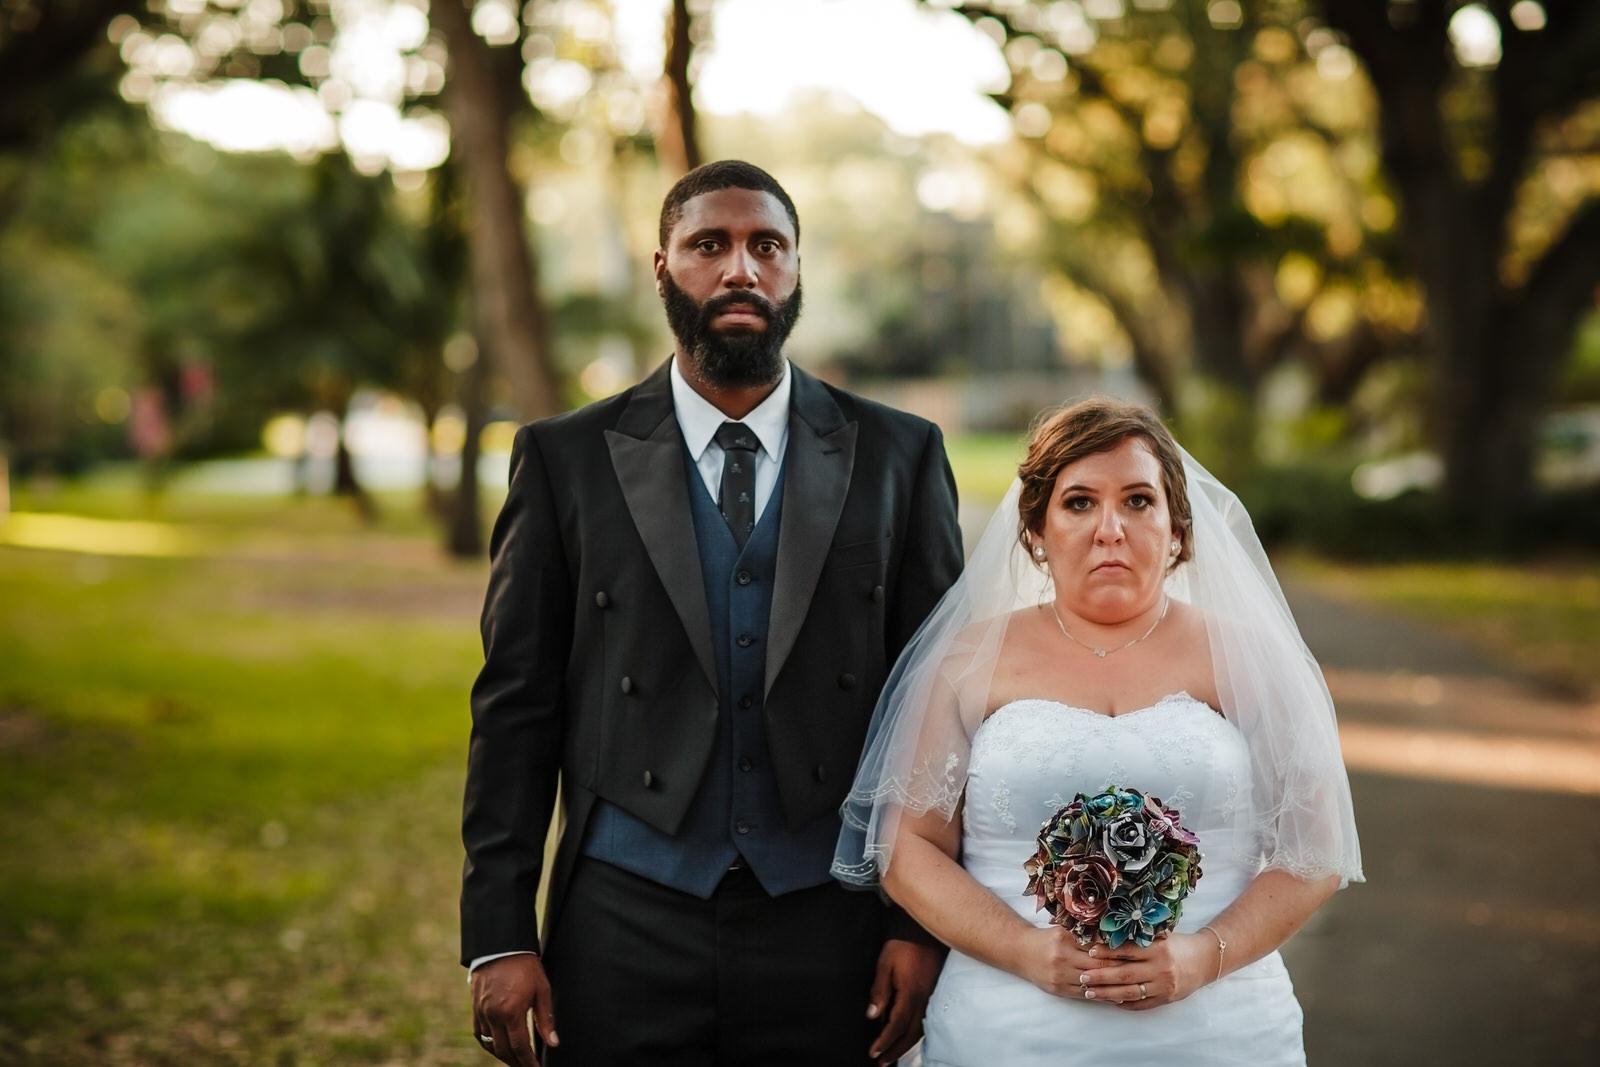 hollywood-american-gothic-wedding-portrait-tiny-house-photo.jpg